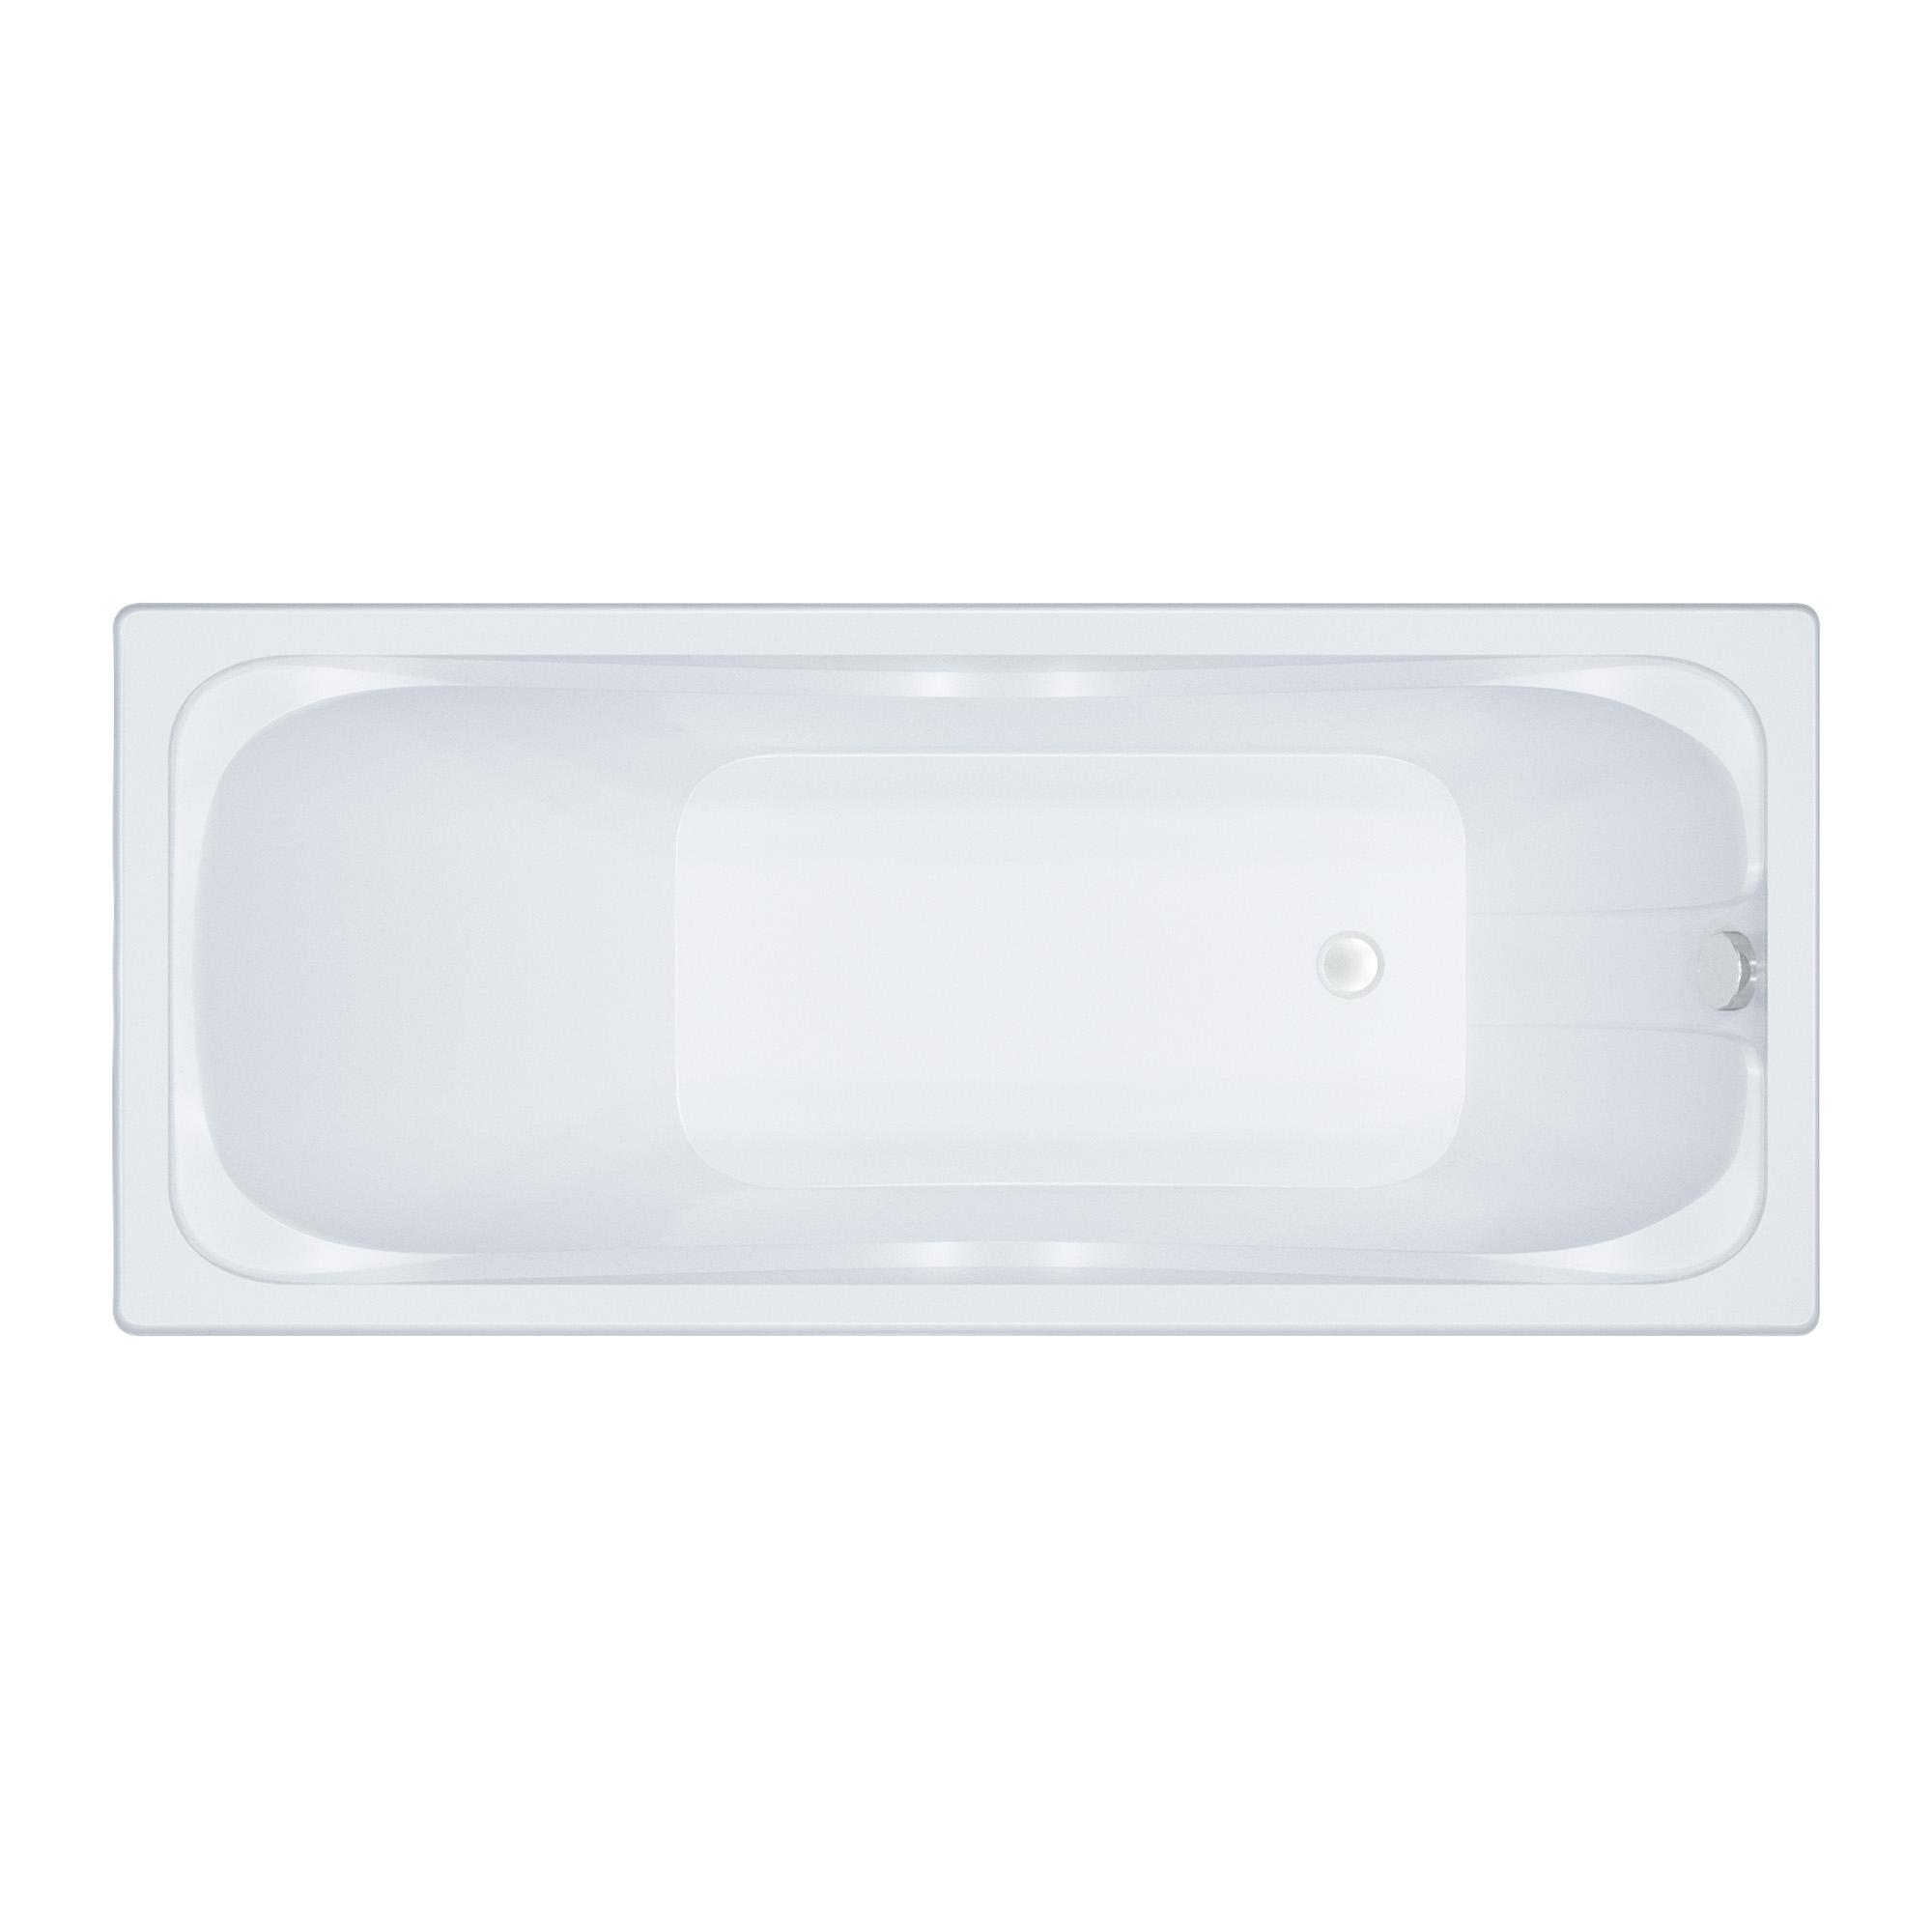 Акриловая ванна Тритон Стандарт 140 экран для ванны triton стандарт 120